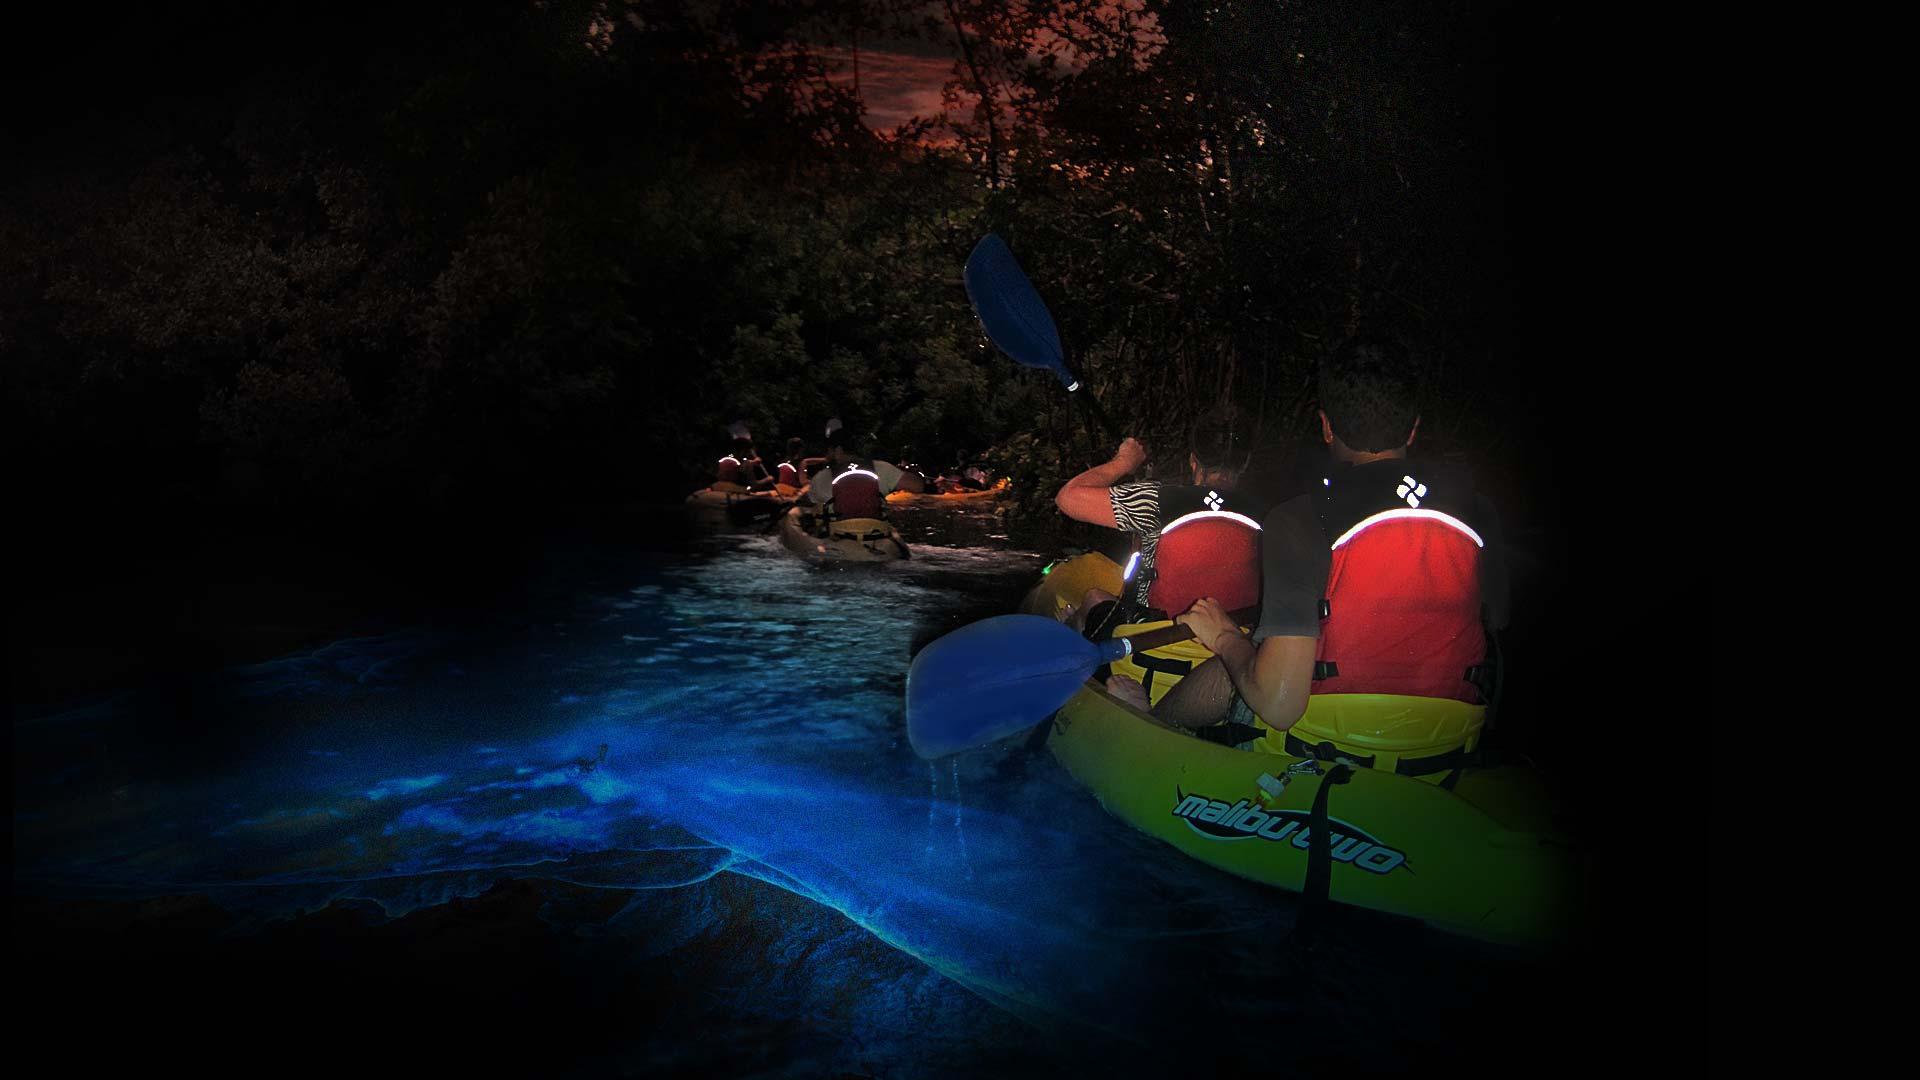 Kayakers entering the mangrove channel of the Fajardo Bio Bay Bioluminescent Bay Puerto Rico, with Kayaking Puerto Rico Bioluminescence Kayak Tour